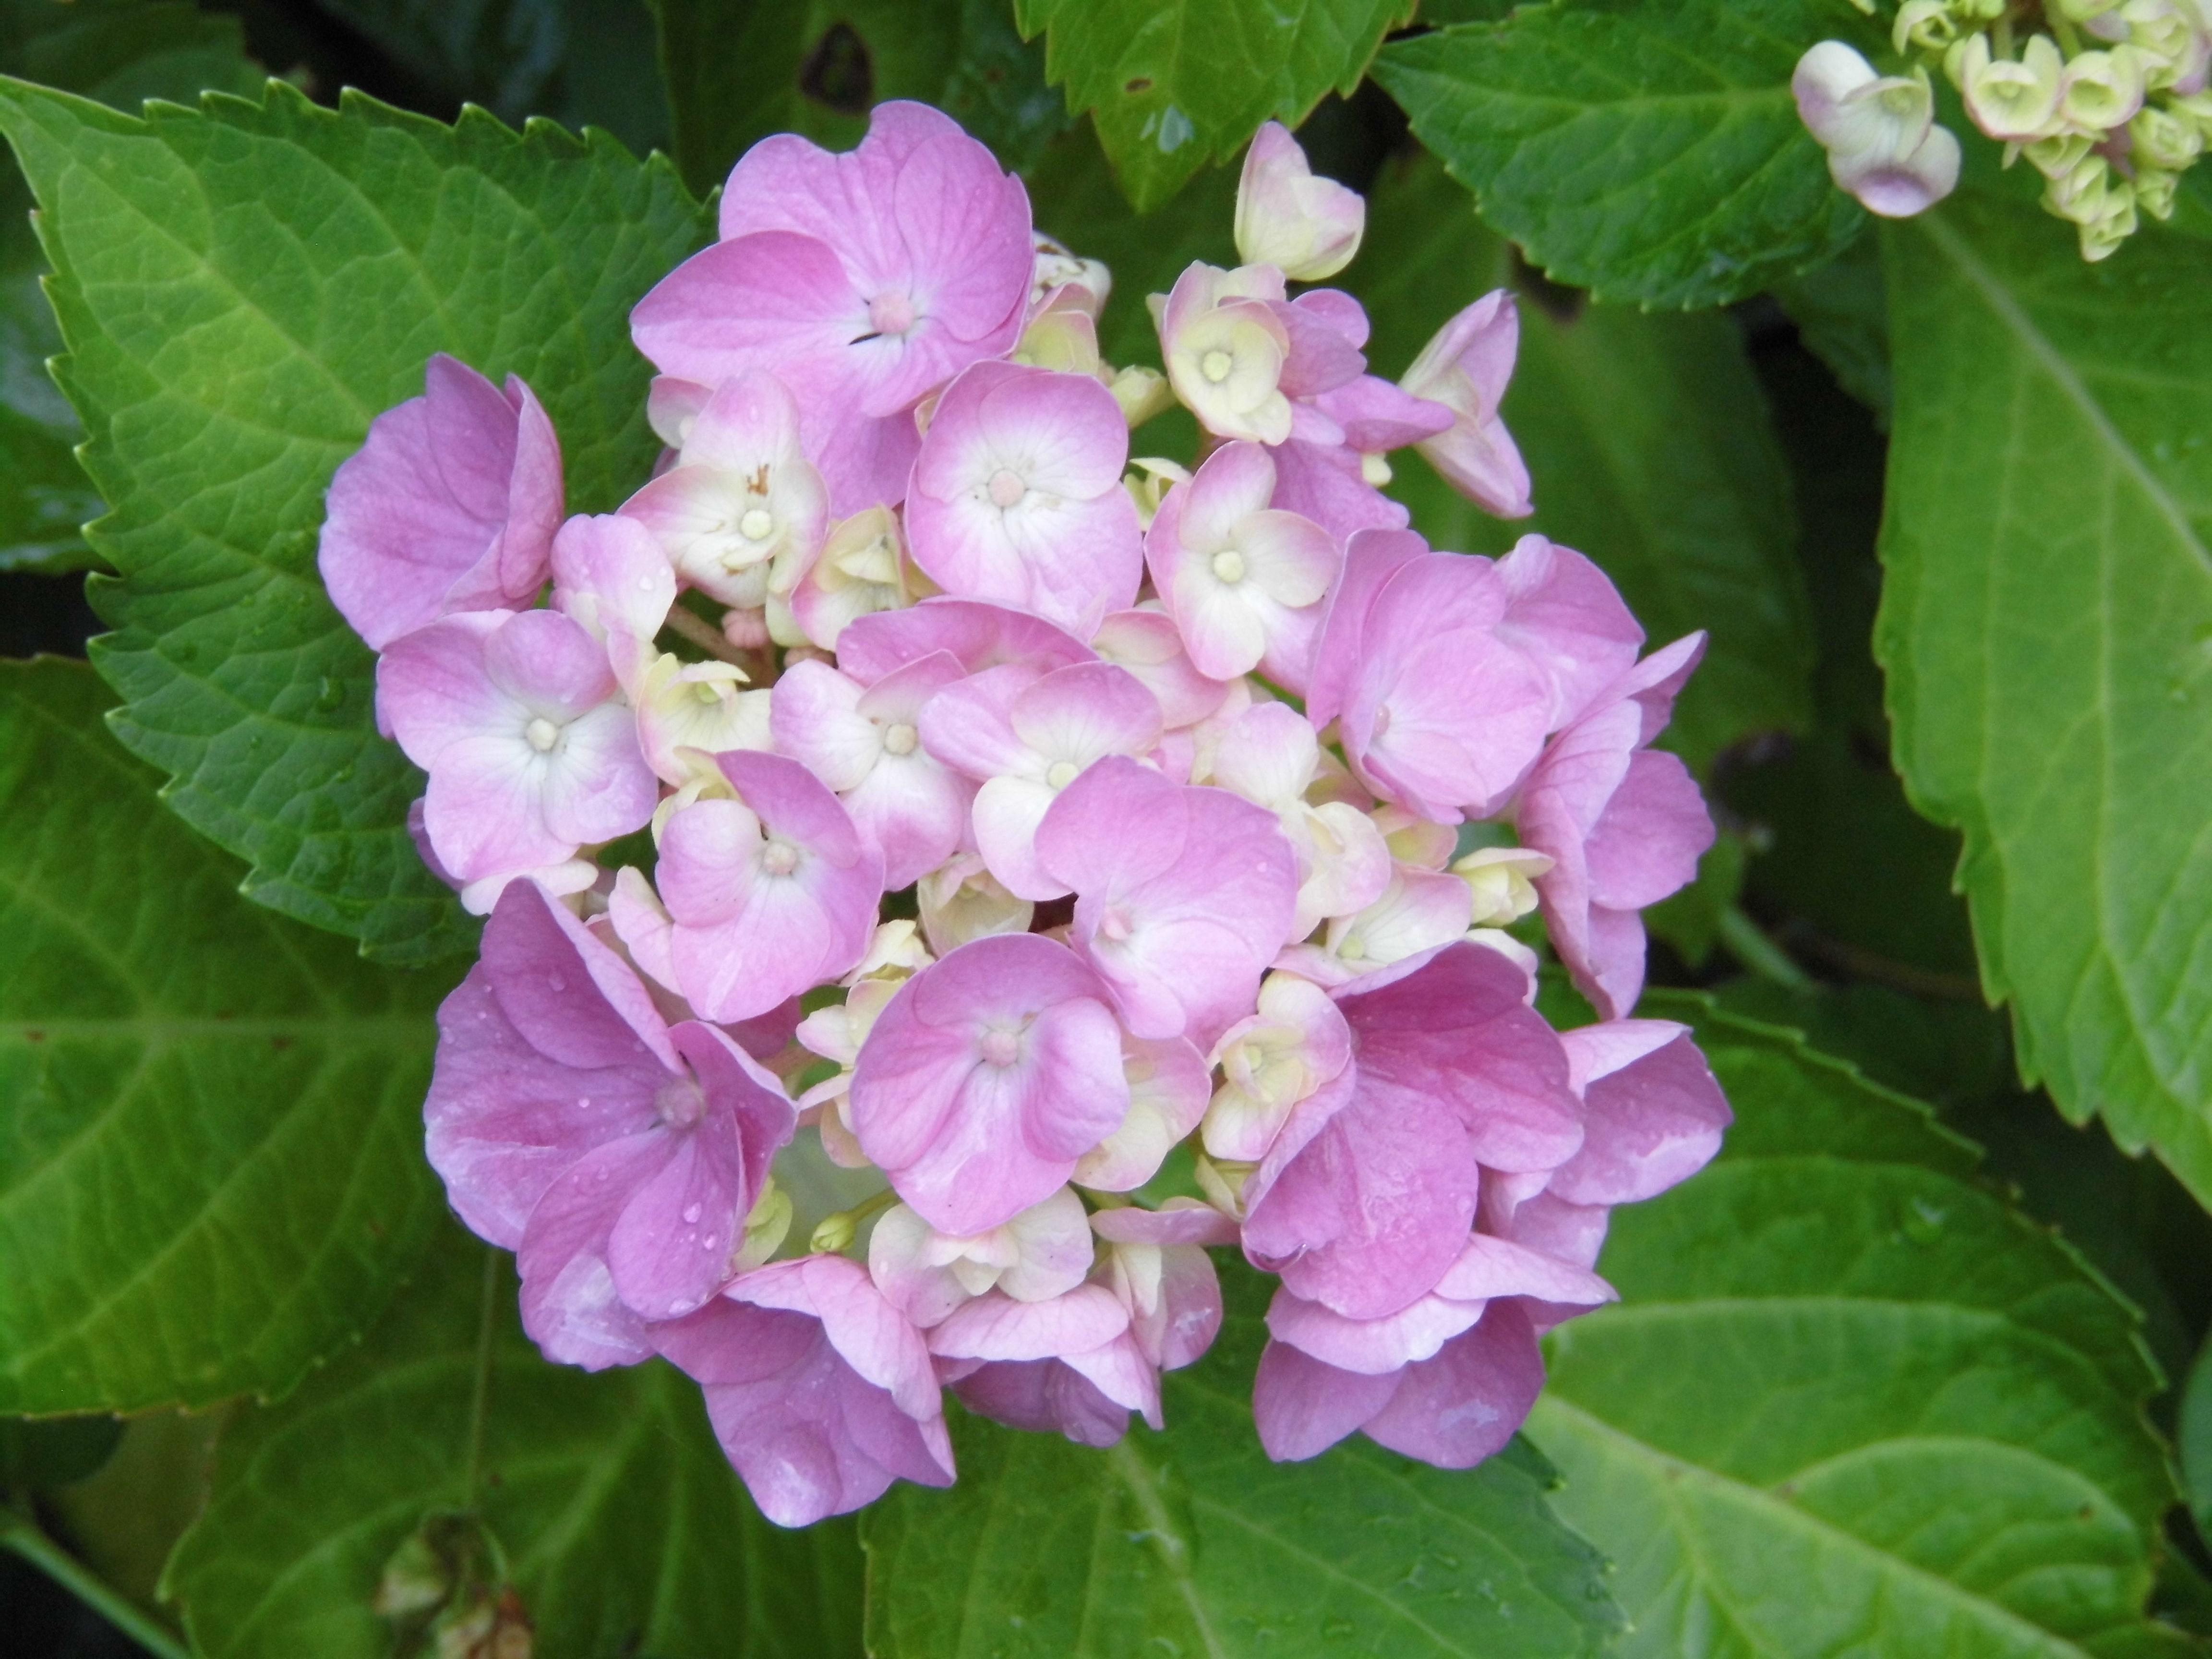 Gratis Billeder Blomst Lilla Blomster Busk Rosenblade